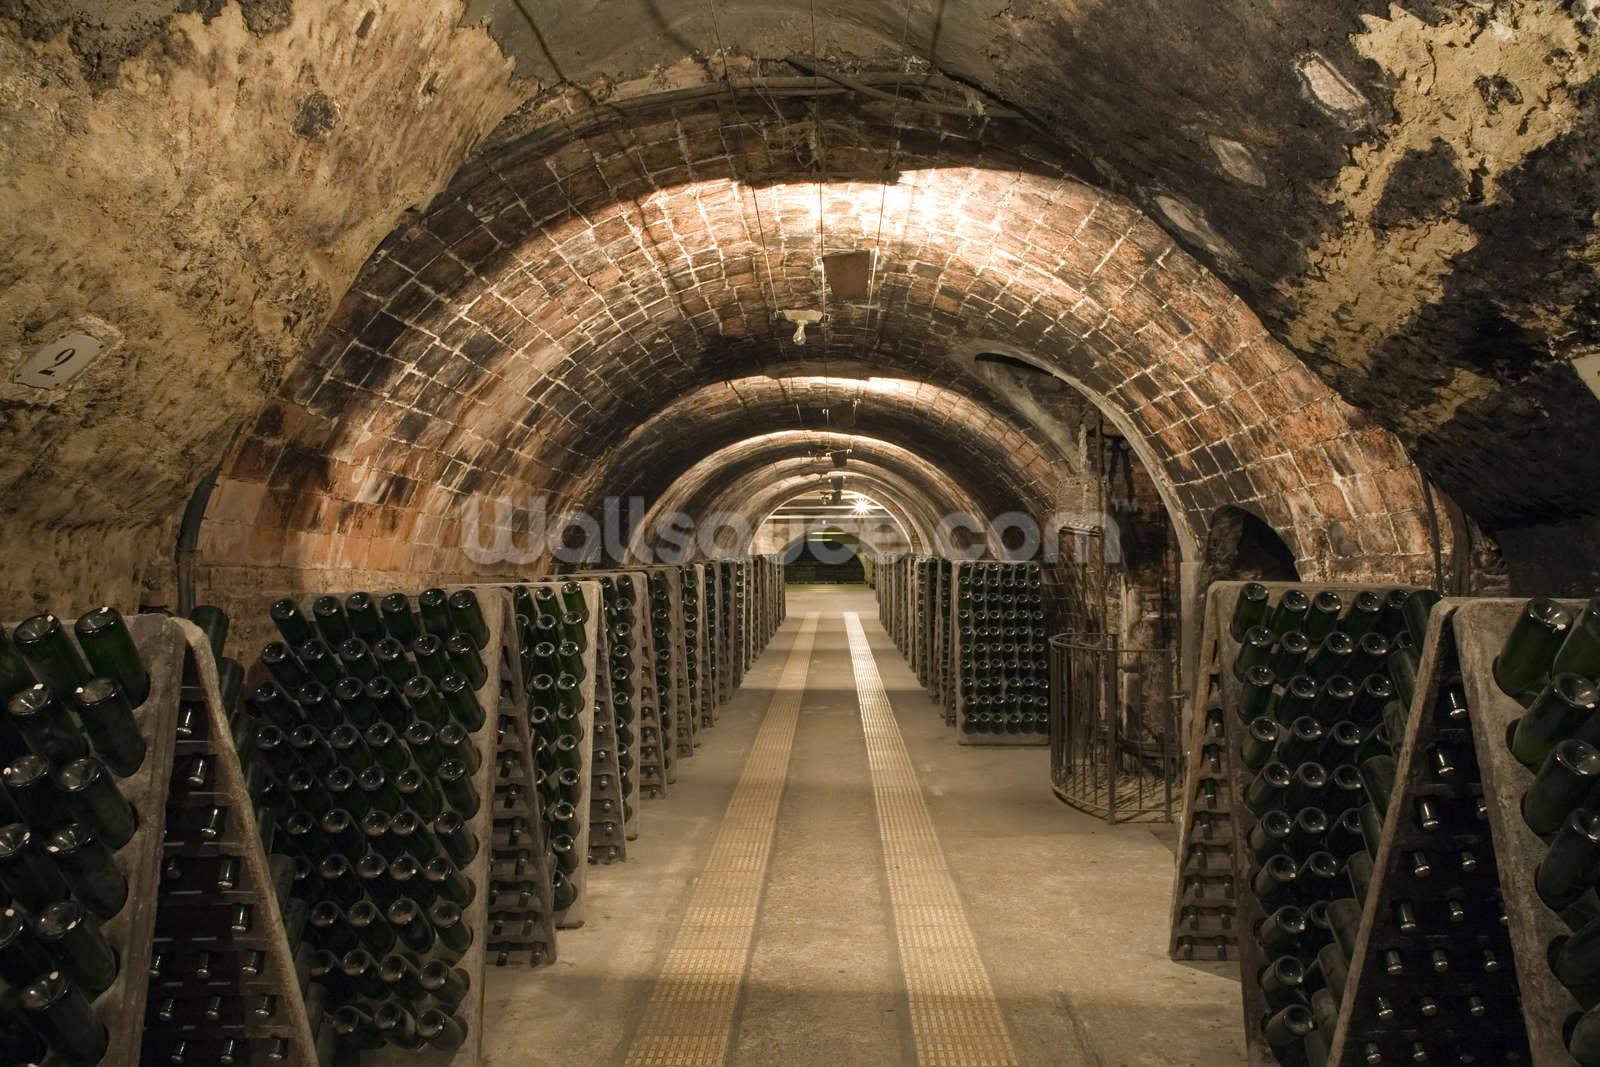 Wine Cellar mural wallpaper & Wine Cellar Wallpaper Wall Mural | Wallsauce USA